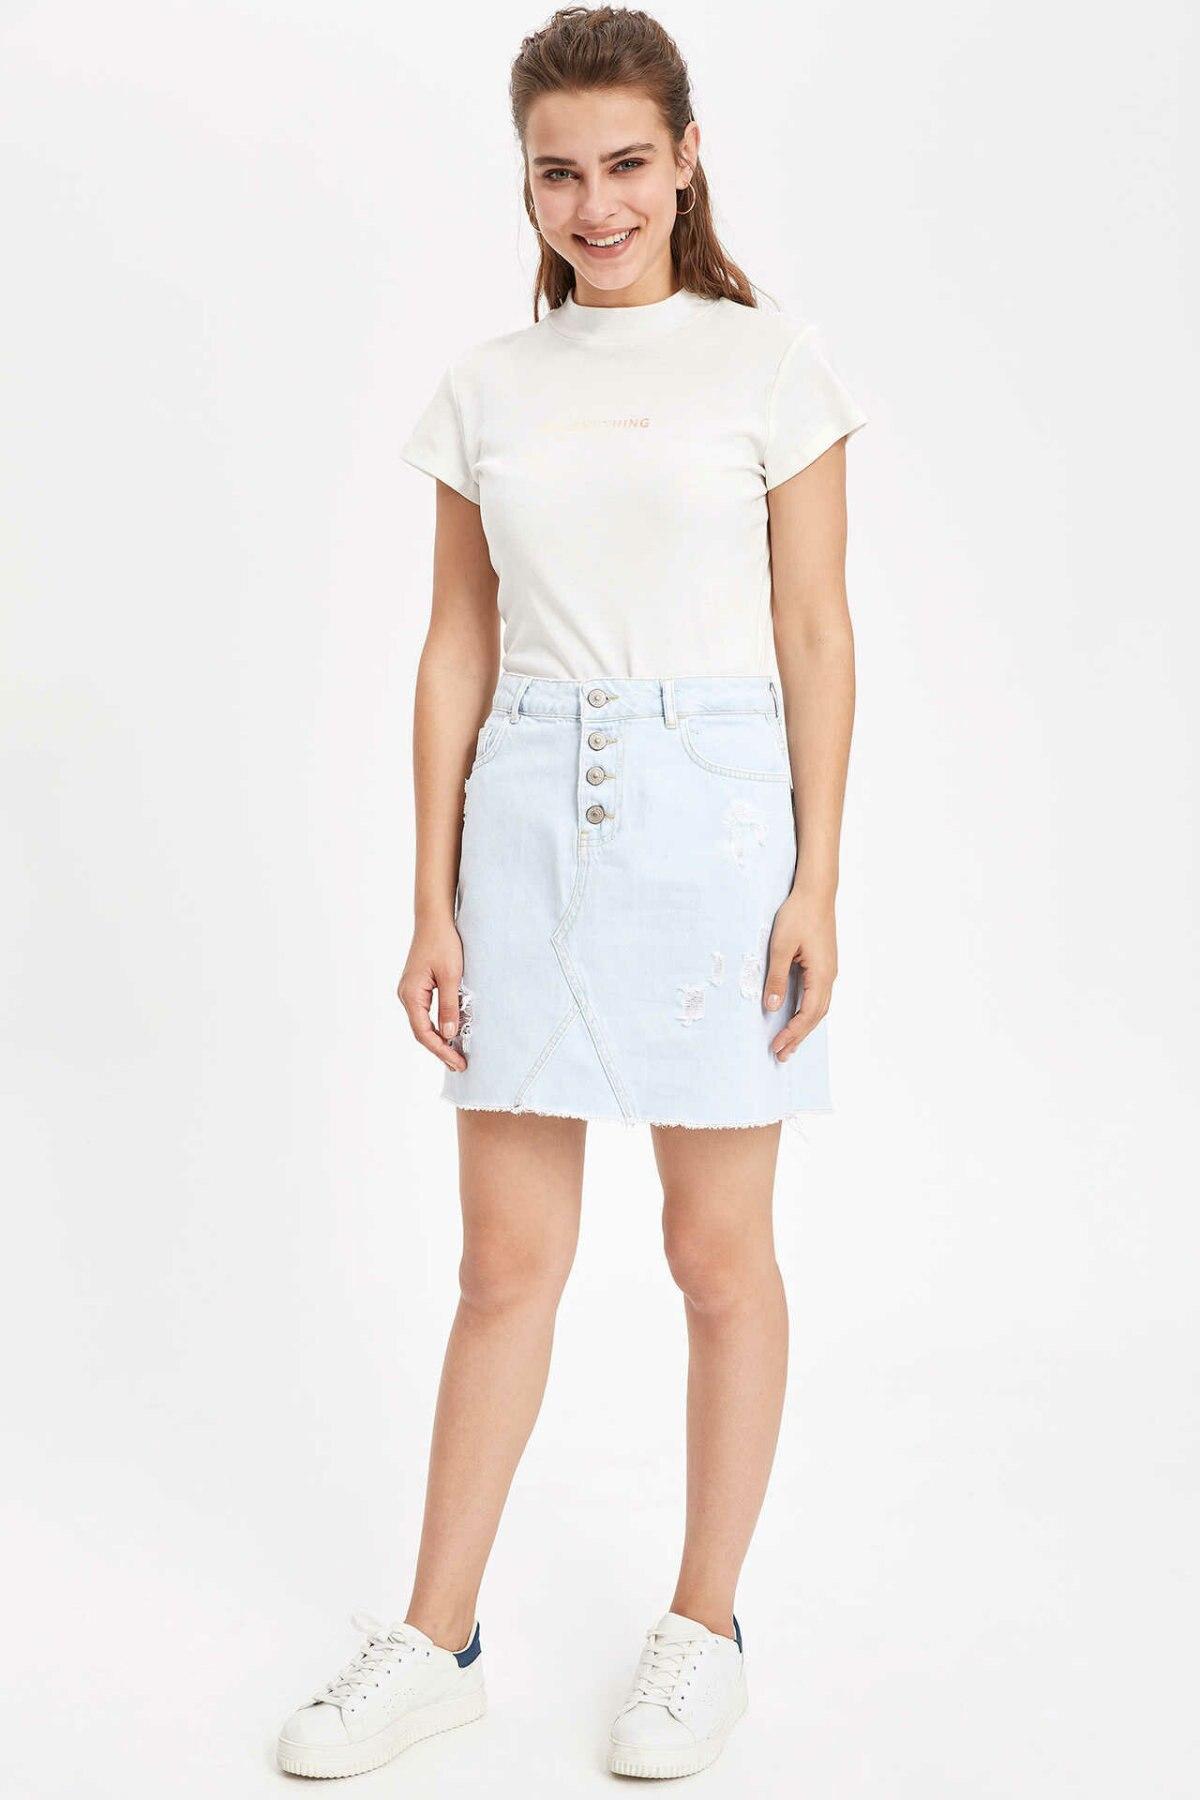 DeFacto Woman Fashion Denim Skirt Ladies Casual Light Blue Short Jeans Skirts Female High Quality Summer - K7125AZ19SP